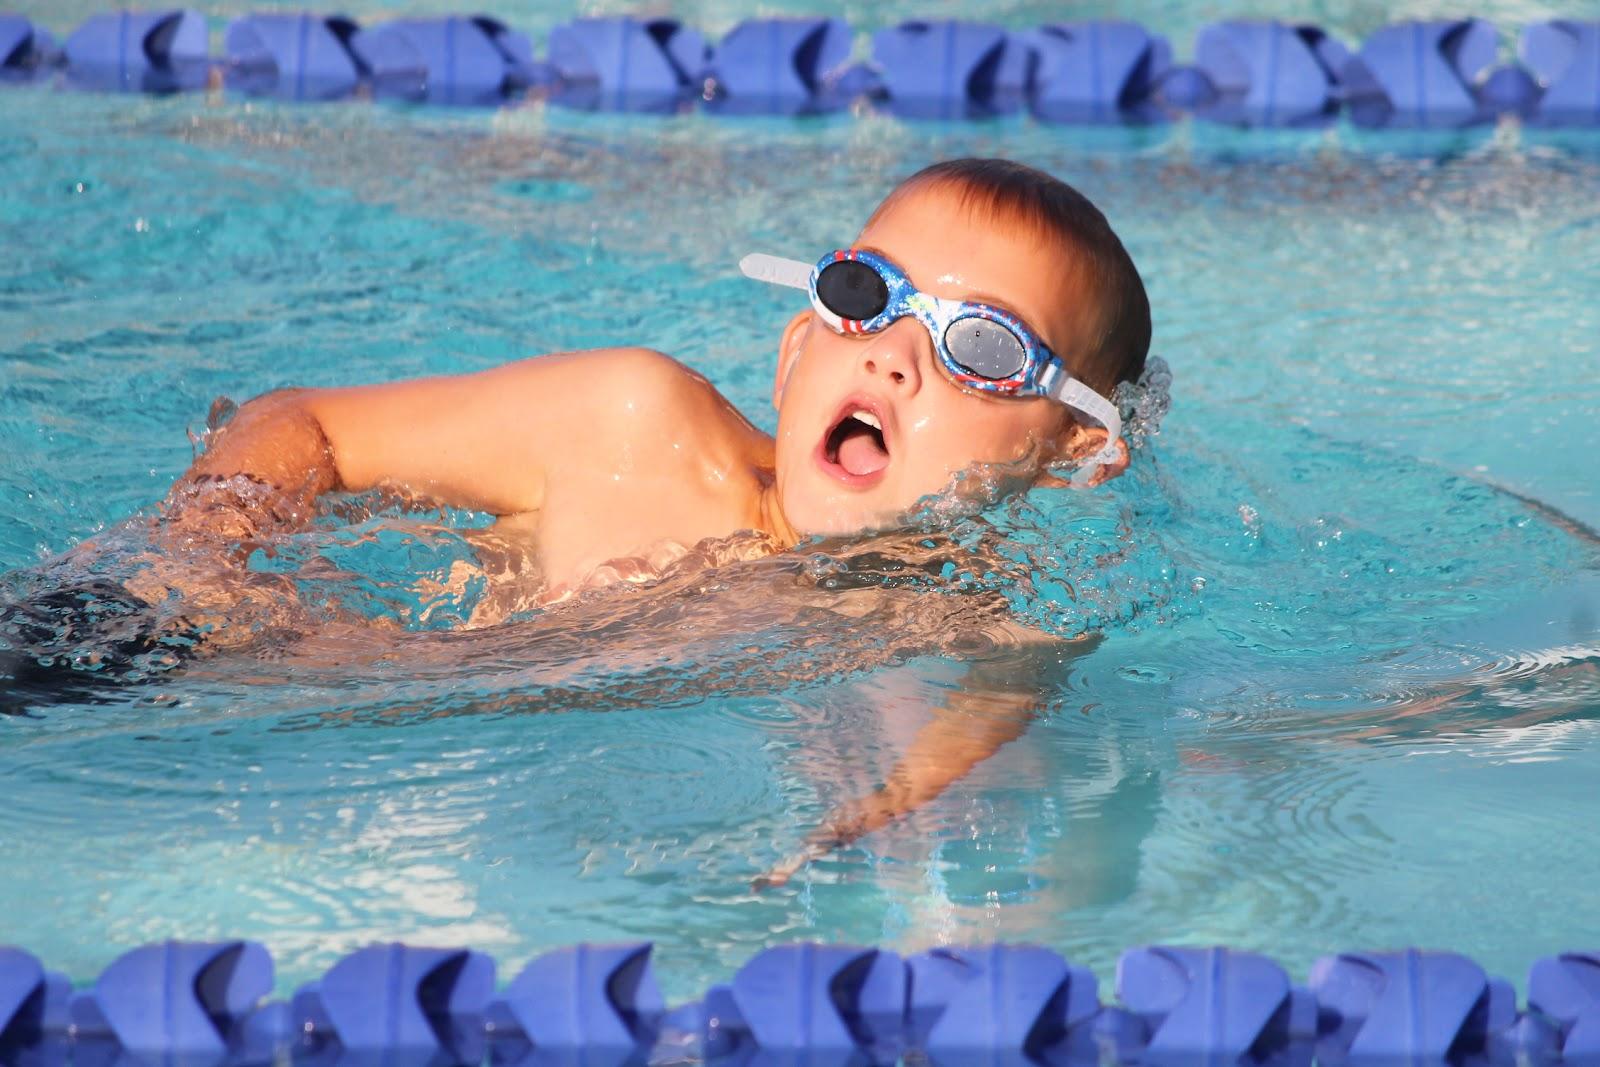 canet swim meet 2012